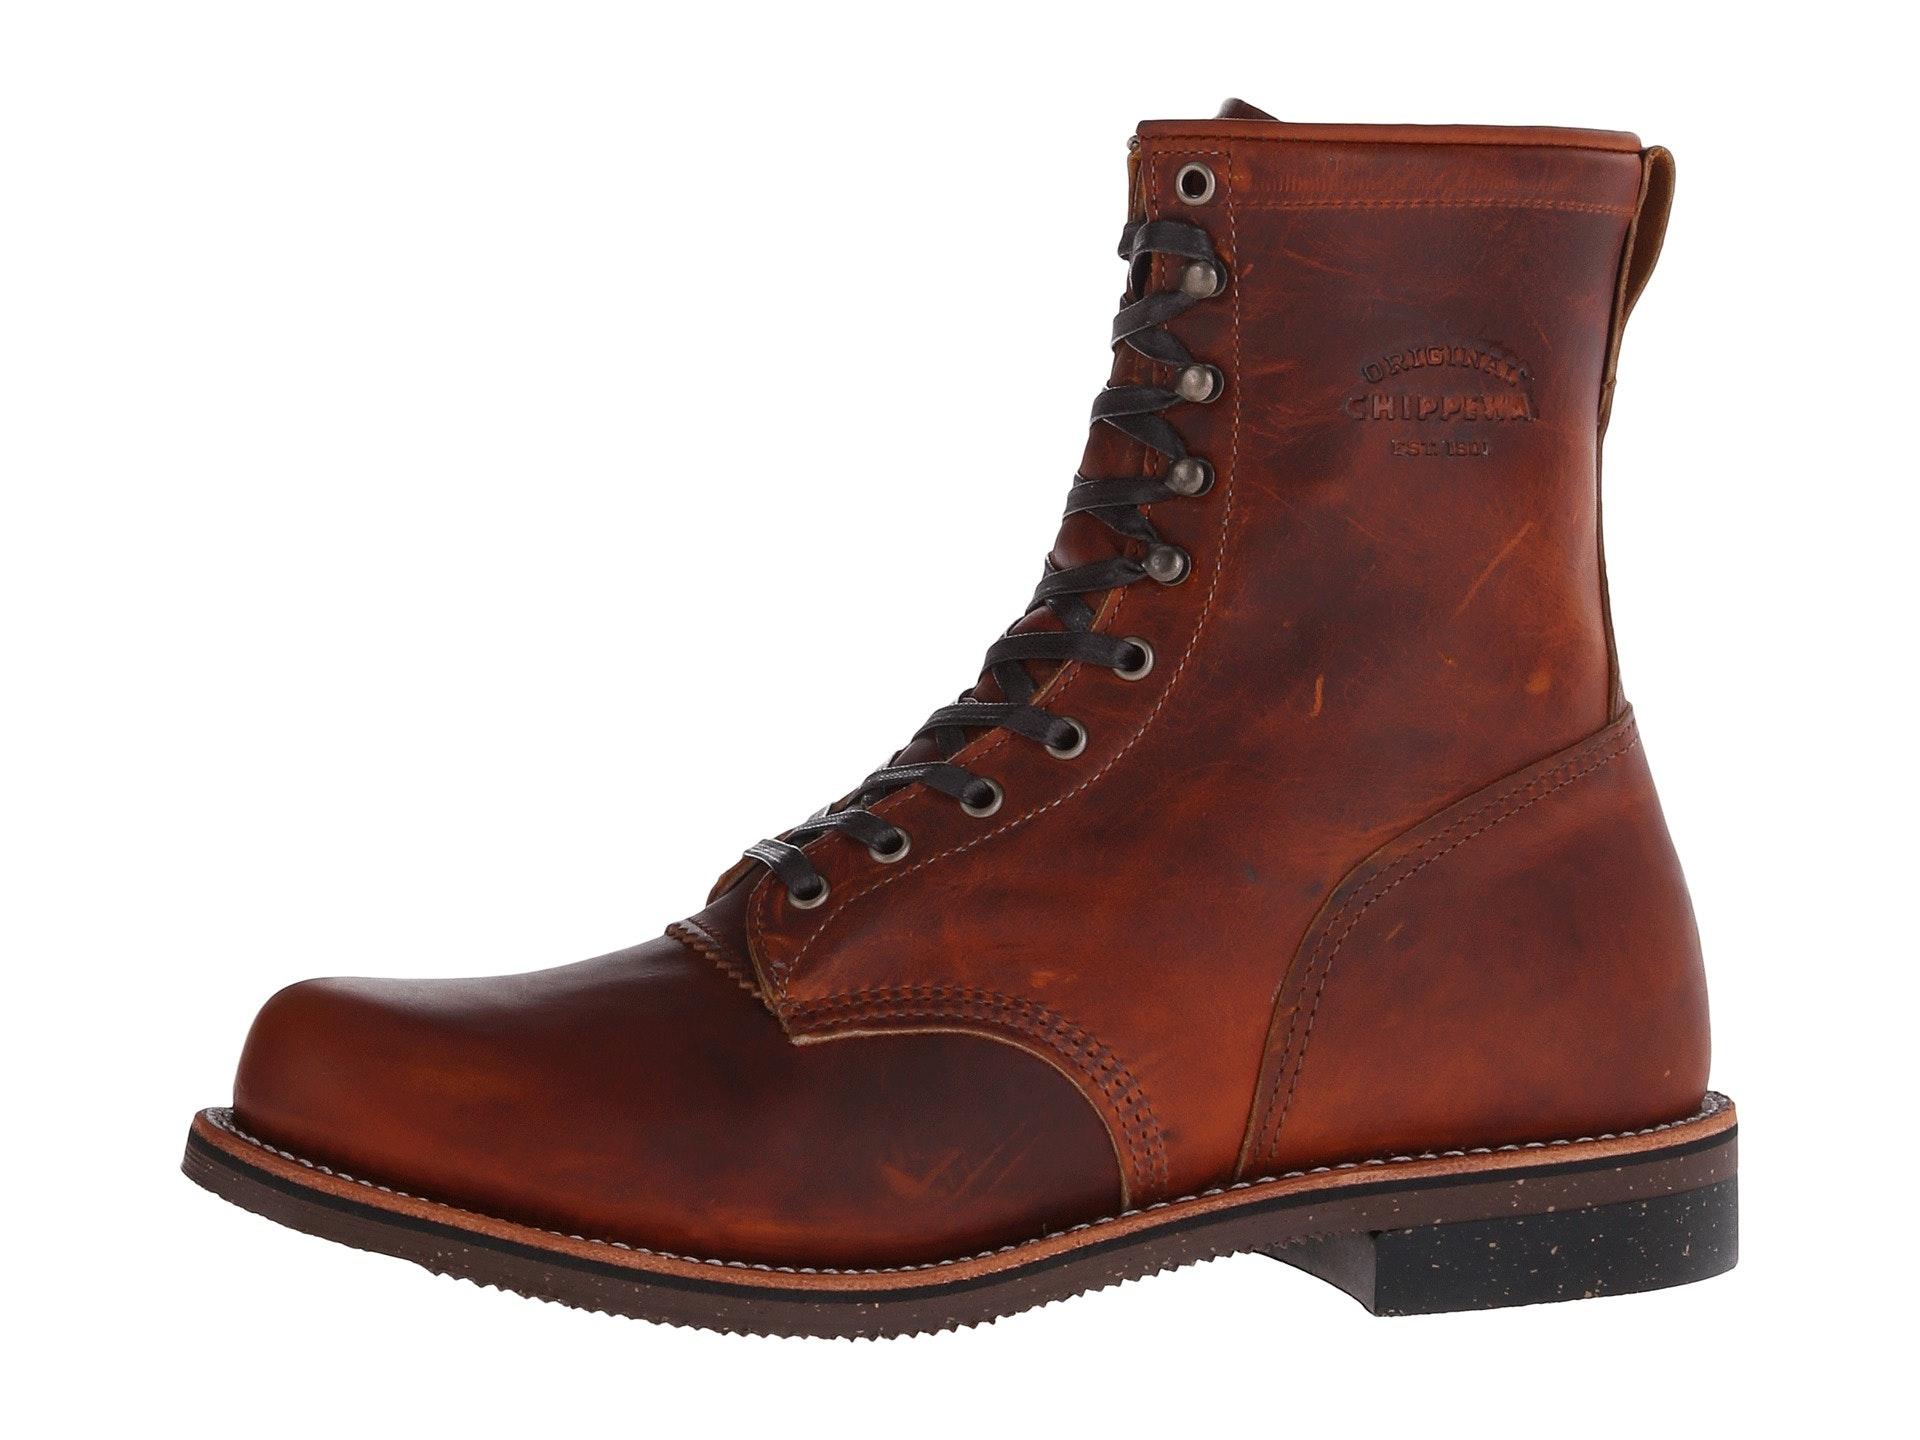 "CHIPPEWA BOOTS #1901G22 8"" TAN RENEGADE SERVICE BOOT"